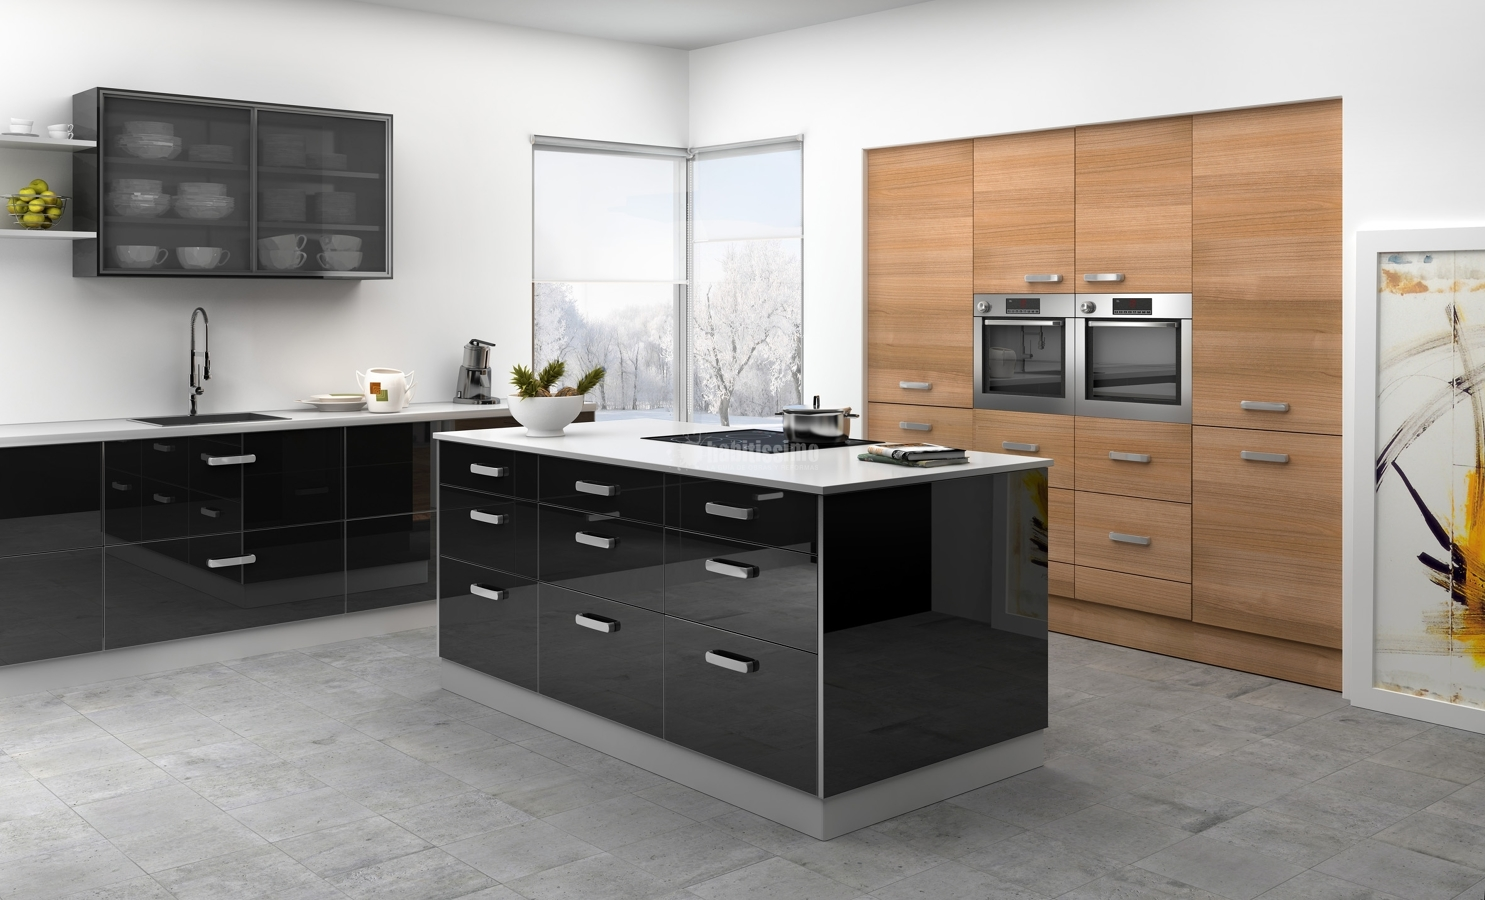 Muebles cocina salamanca 20170820174623 - Muebles epoca salamanca ...